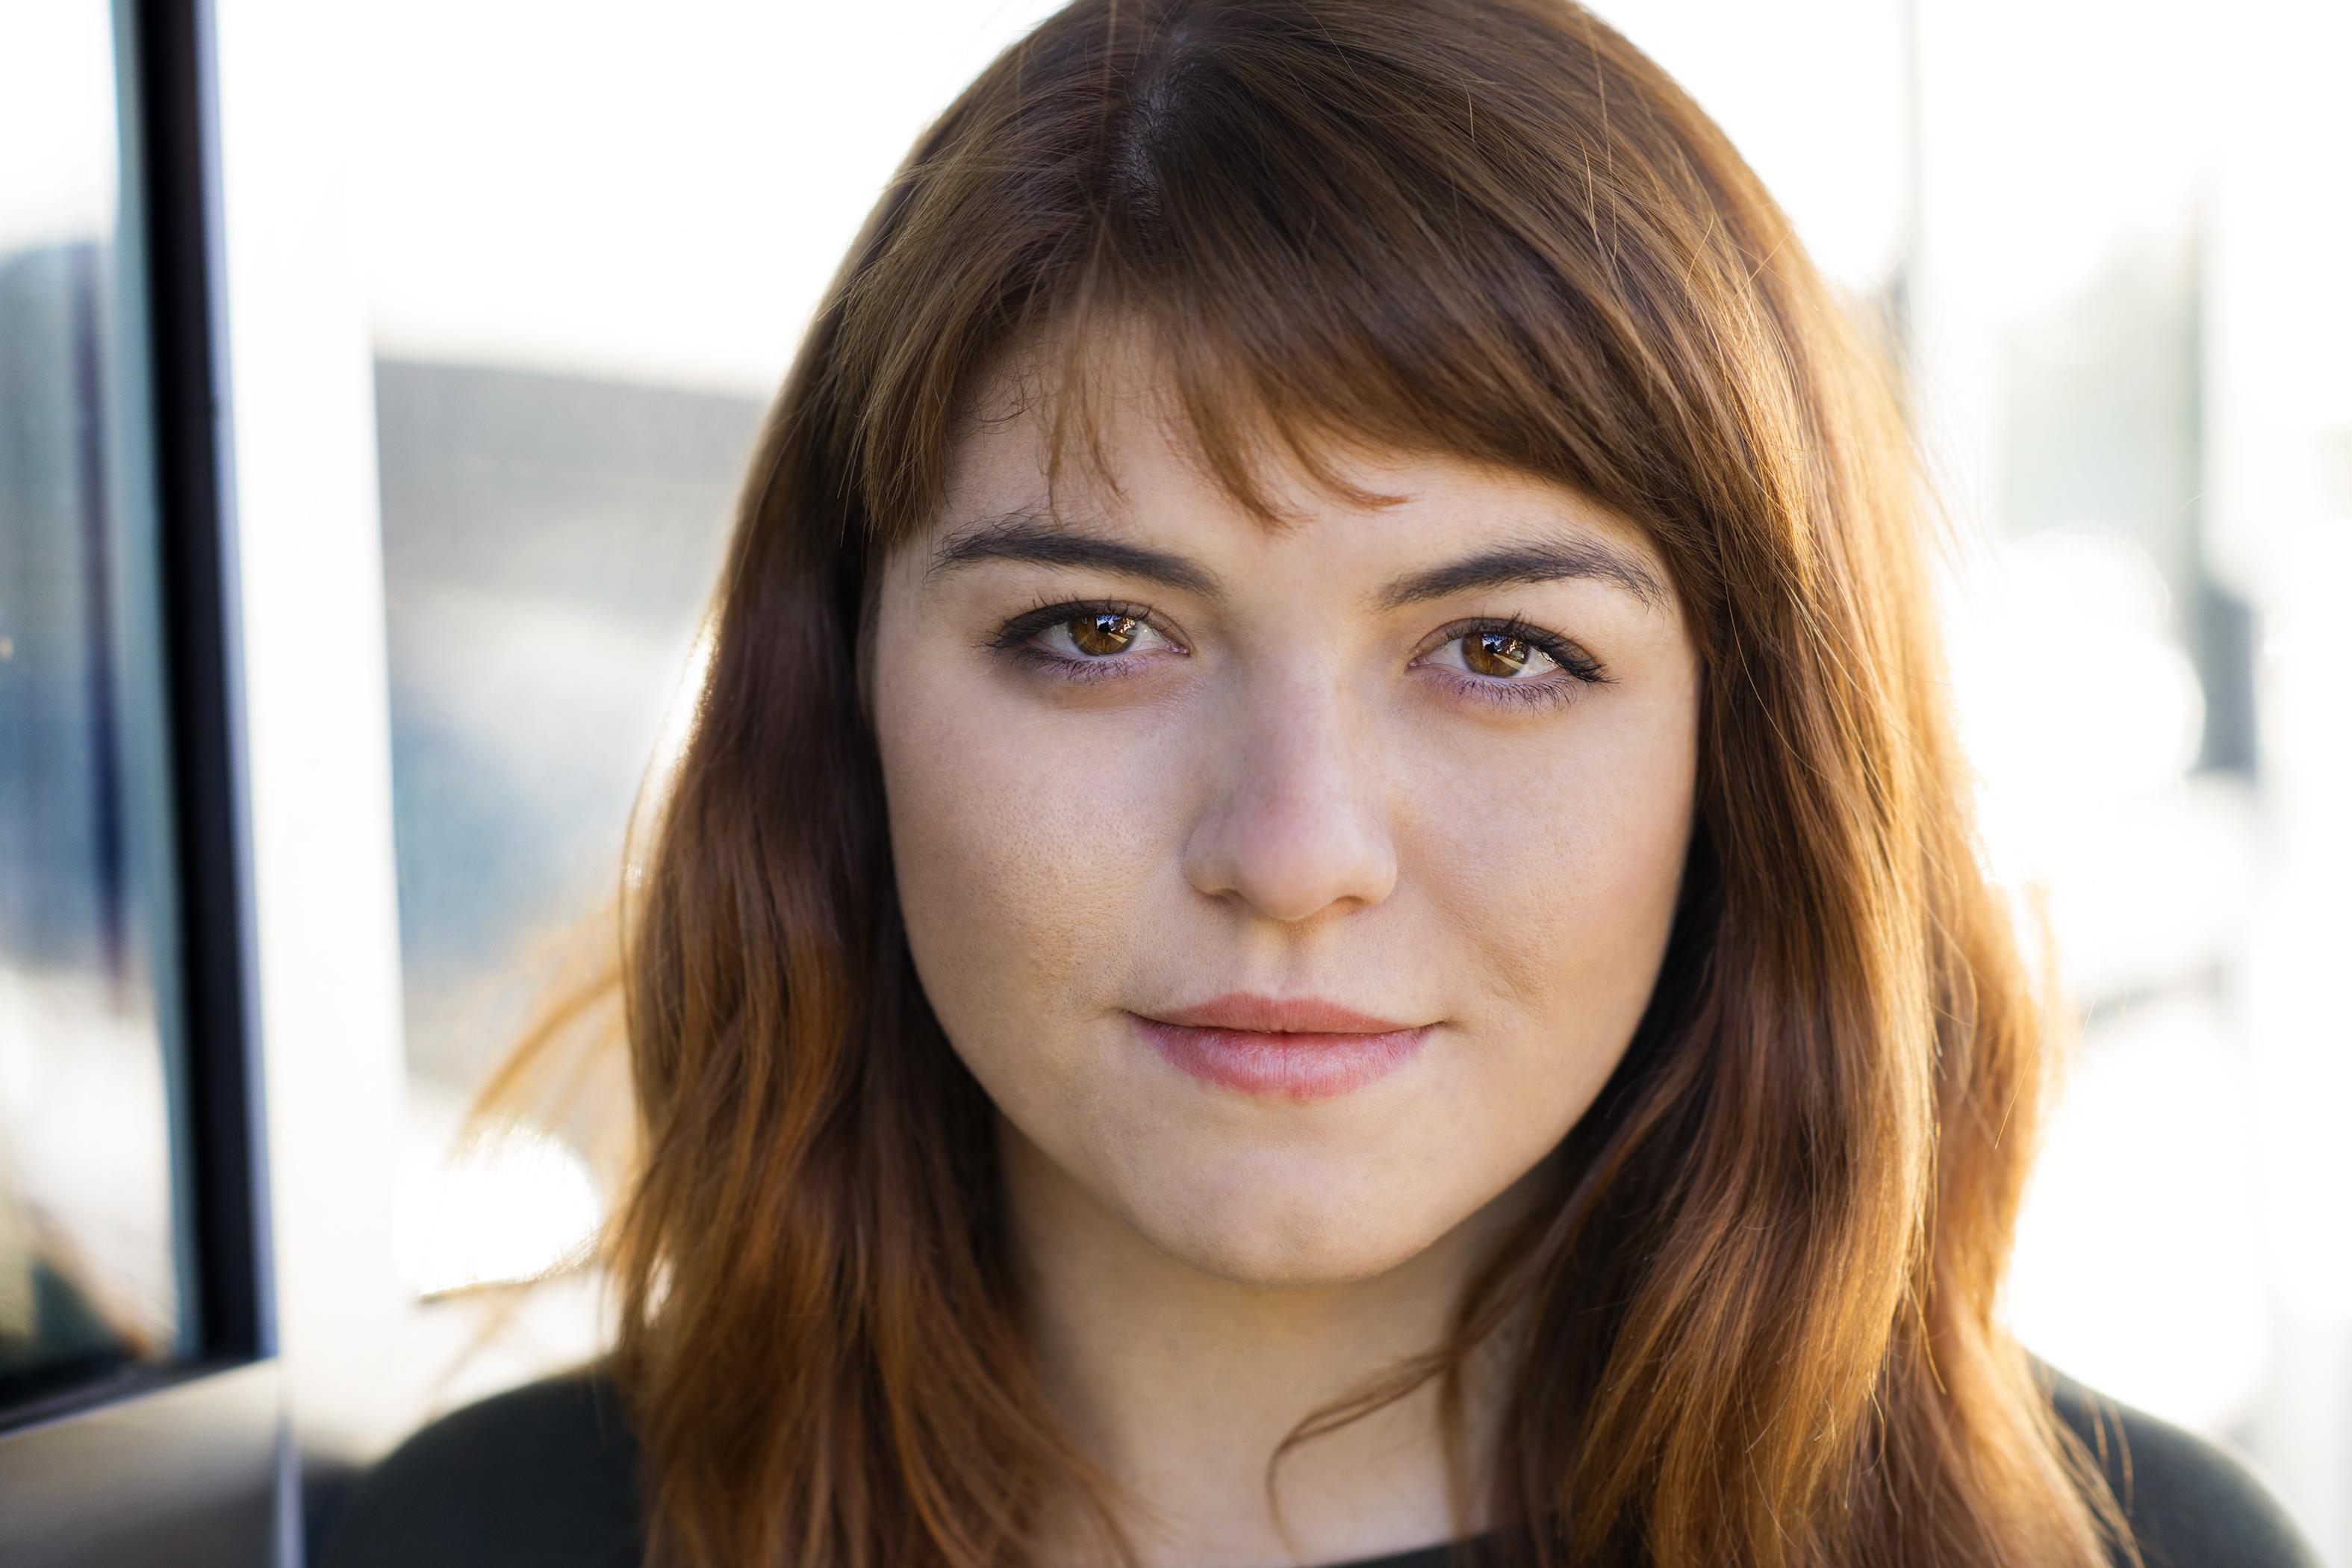 <b>Emily Radosevich</b>